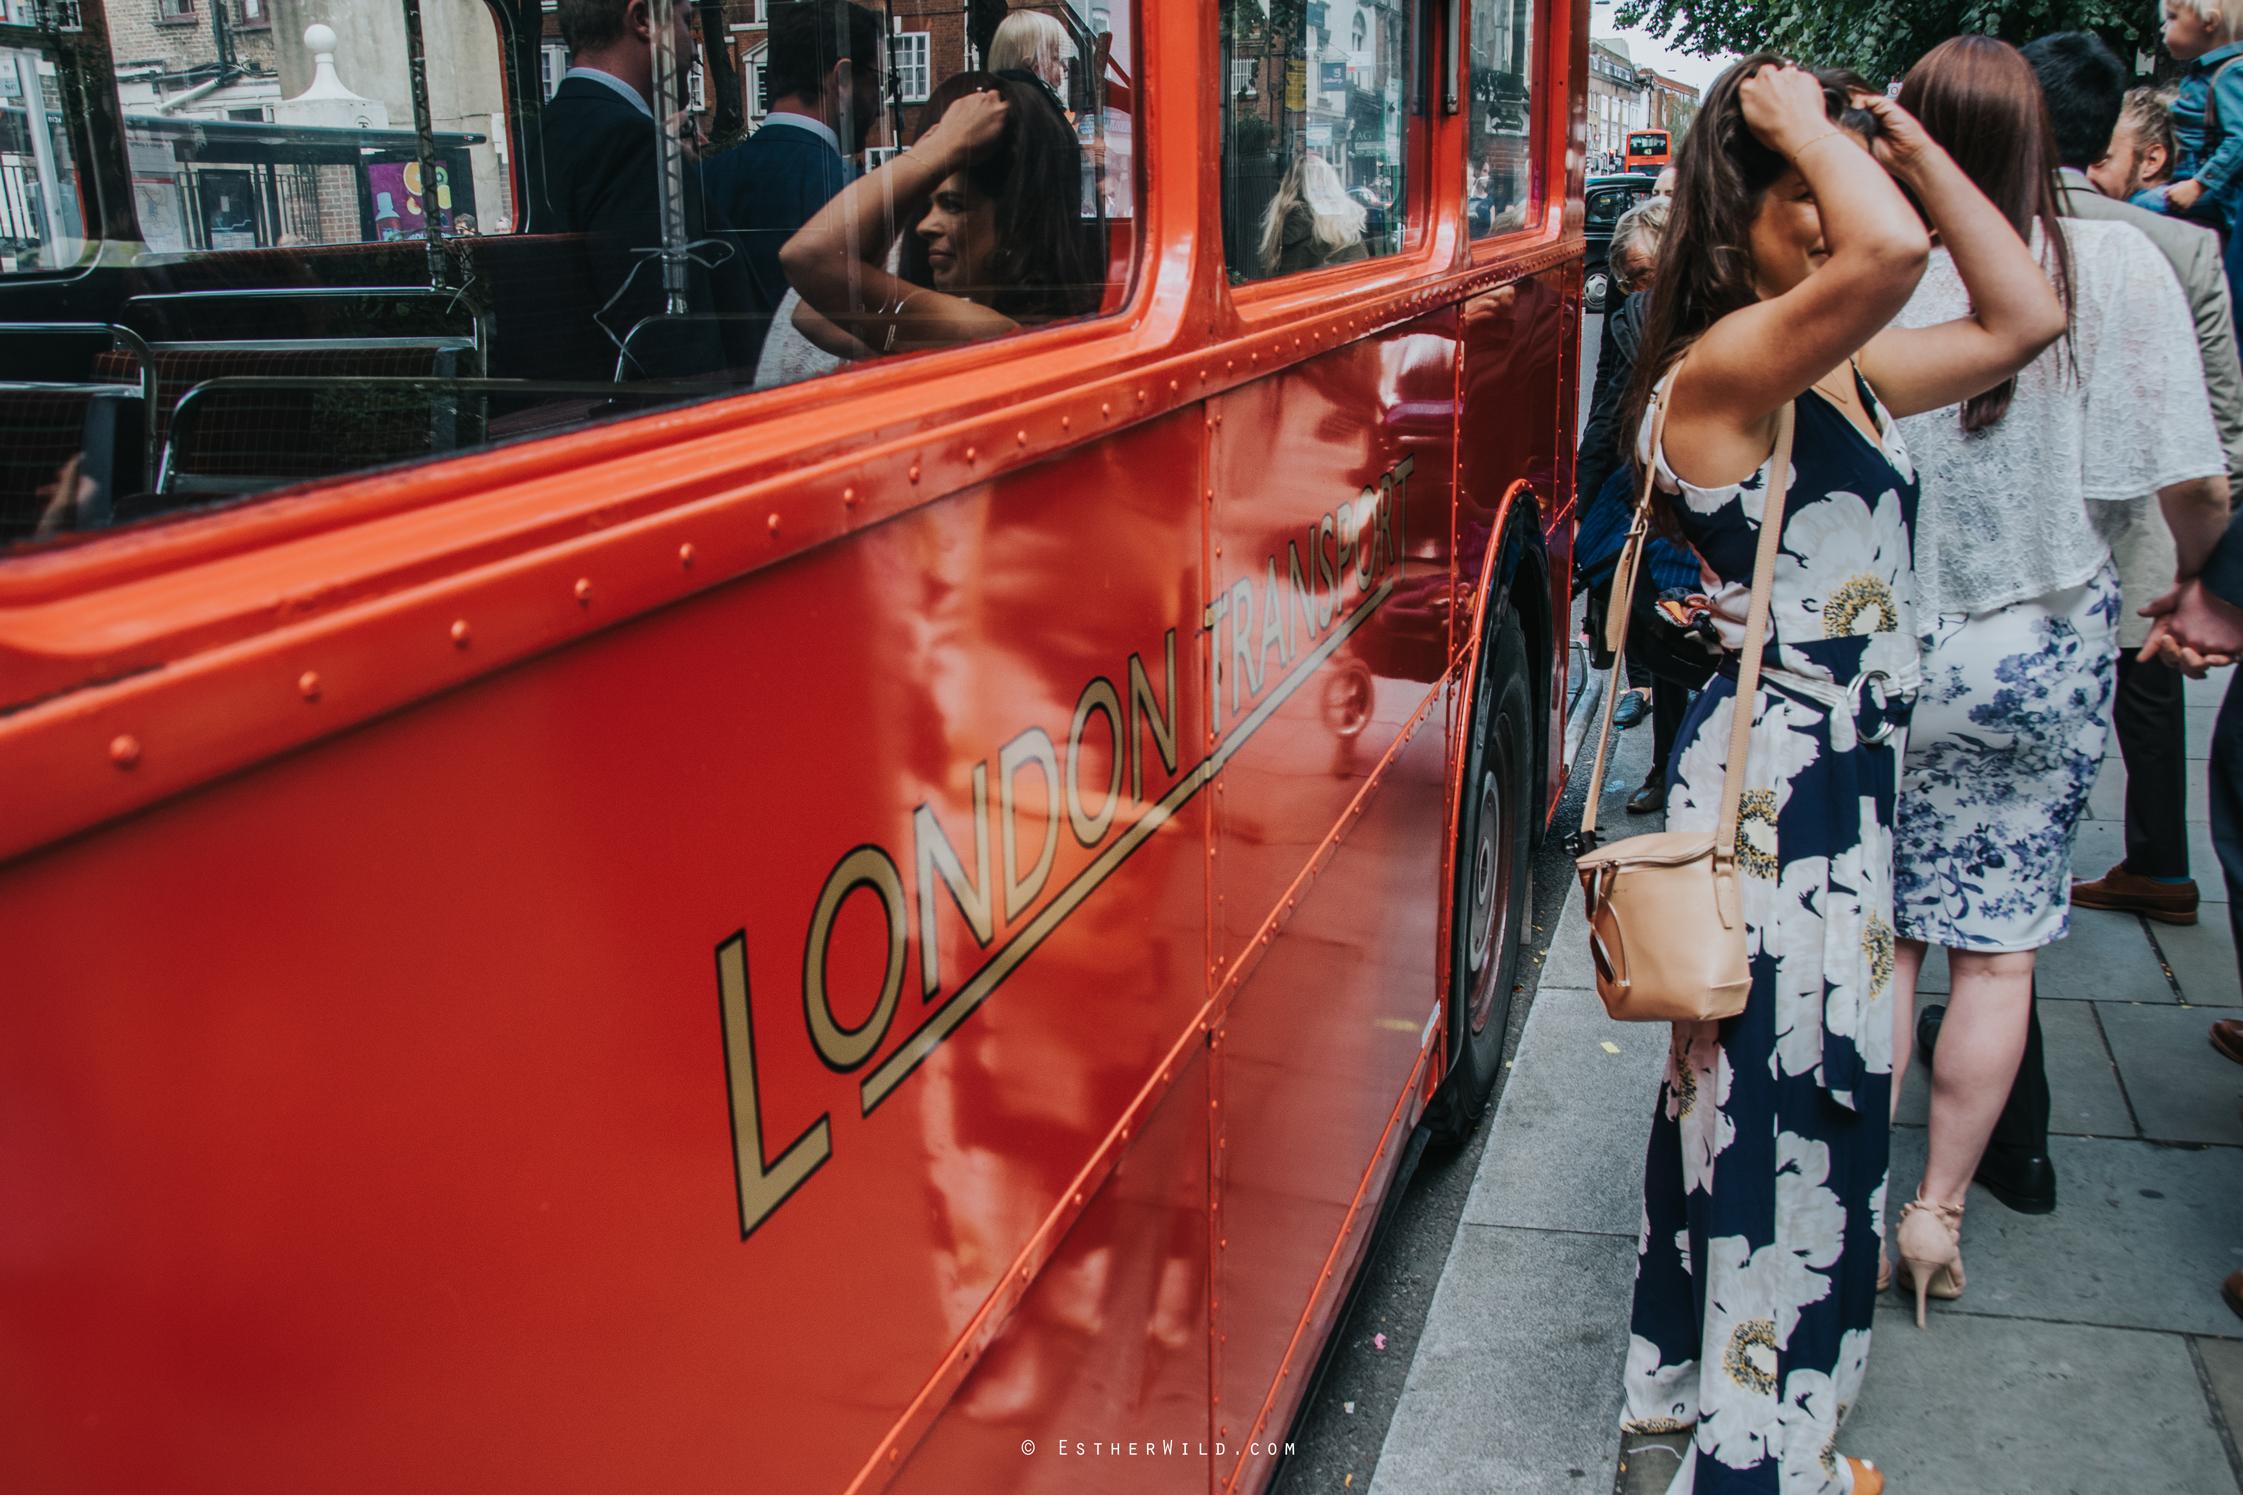 Islington_Town_Hall_Wedding_London_Photographer_Esther_Wild_IMG_5382_DSC_0282.jpg